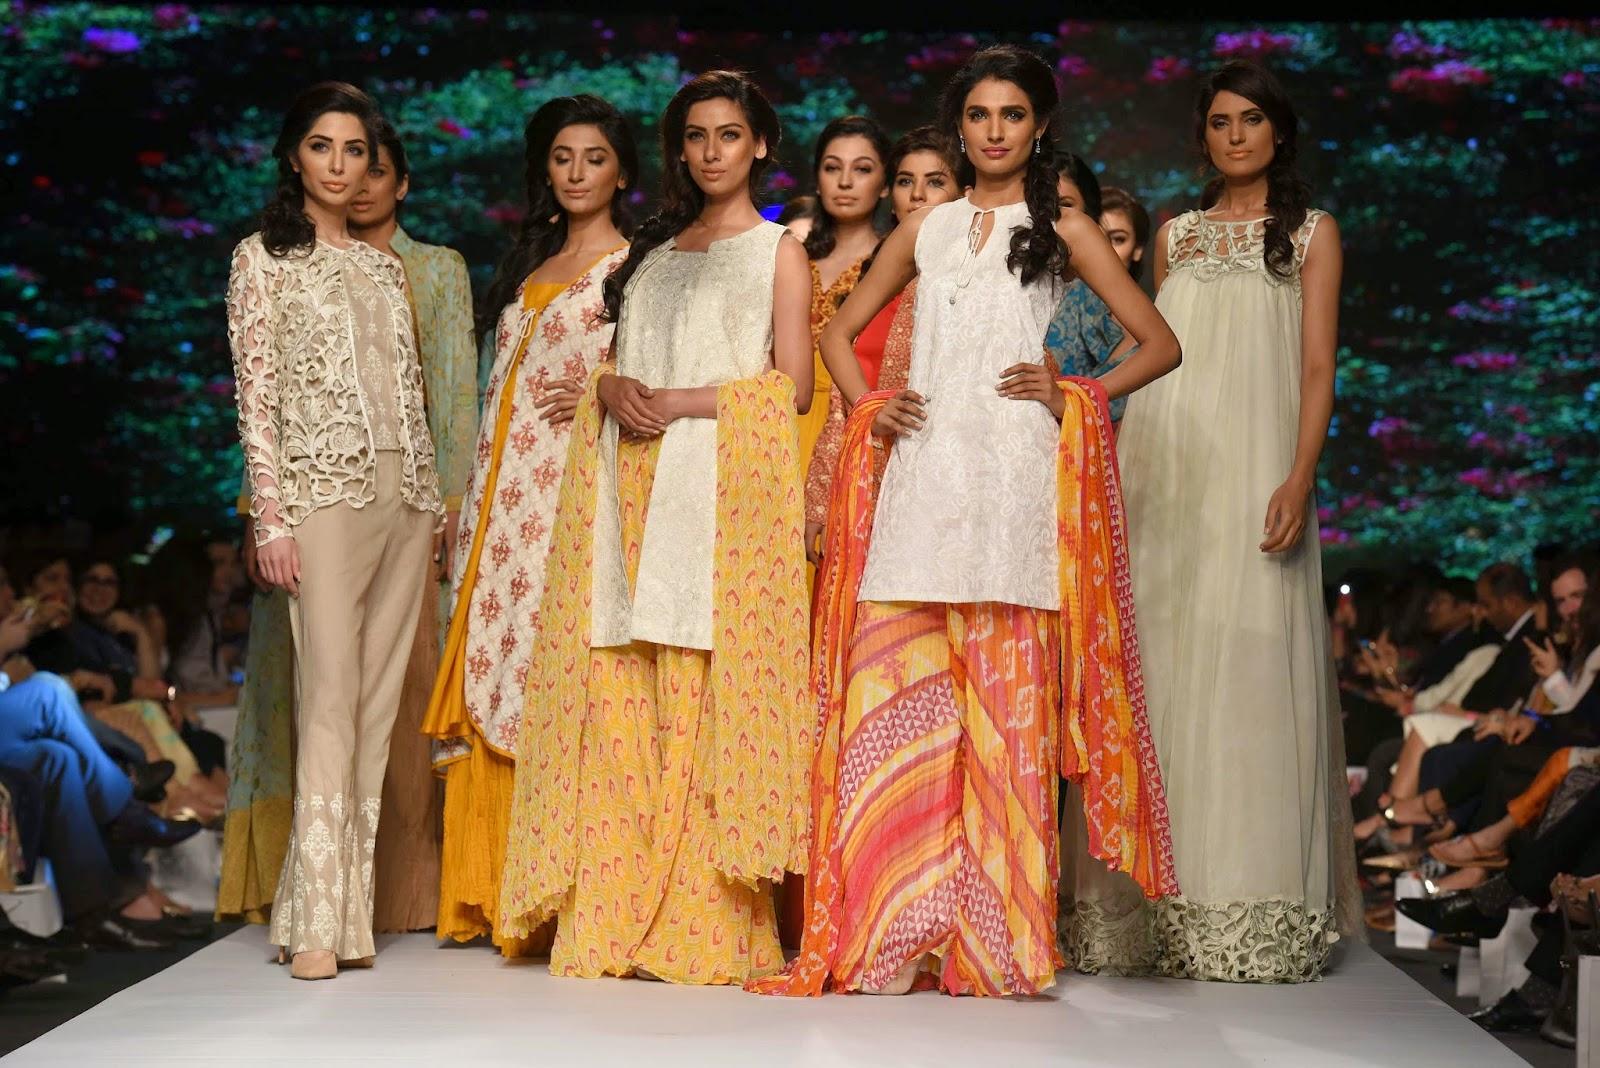 amna ilyas nooray bhatti lala textiles TFPW15